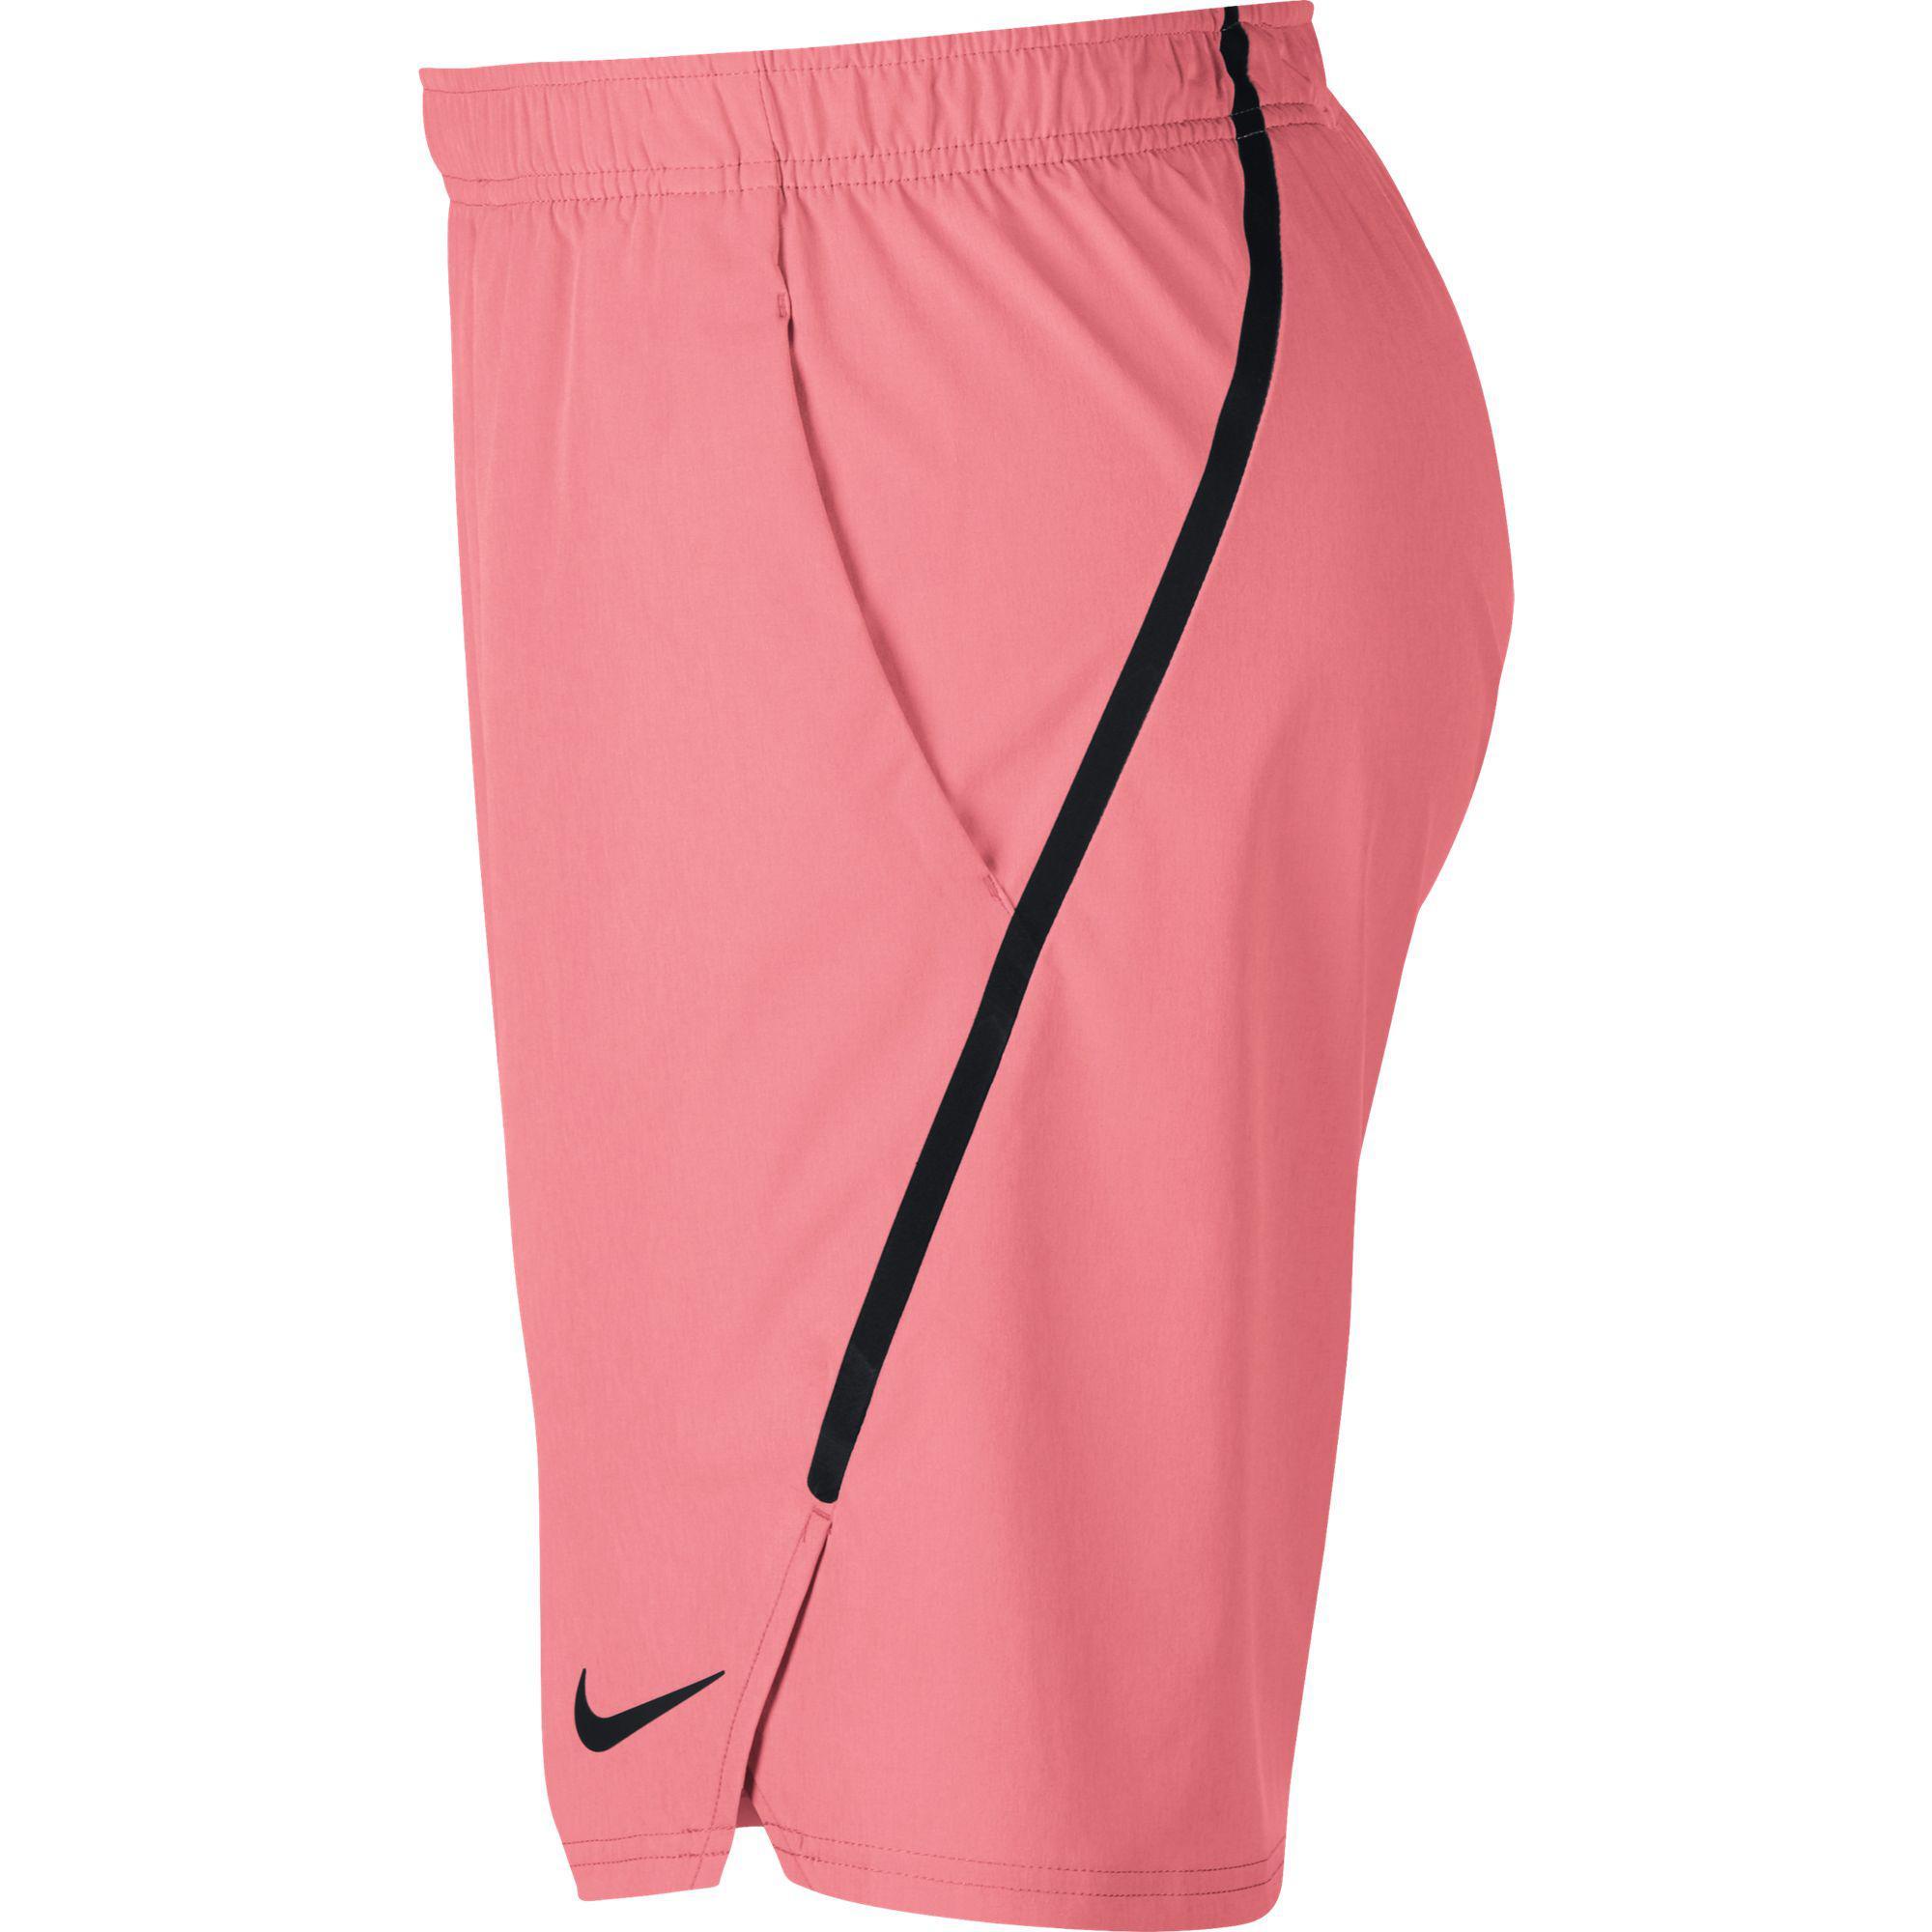 Nike Mens Flex Ace 9 Inch Shorts - Lava Glow/Black - Tennisnuts.com